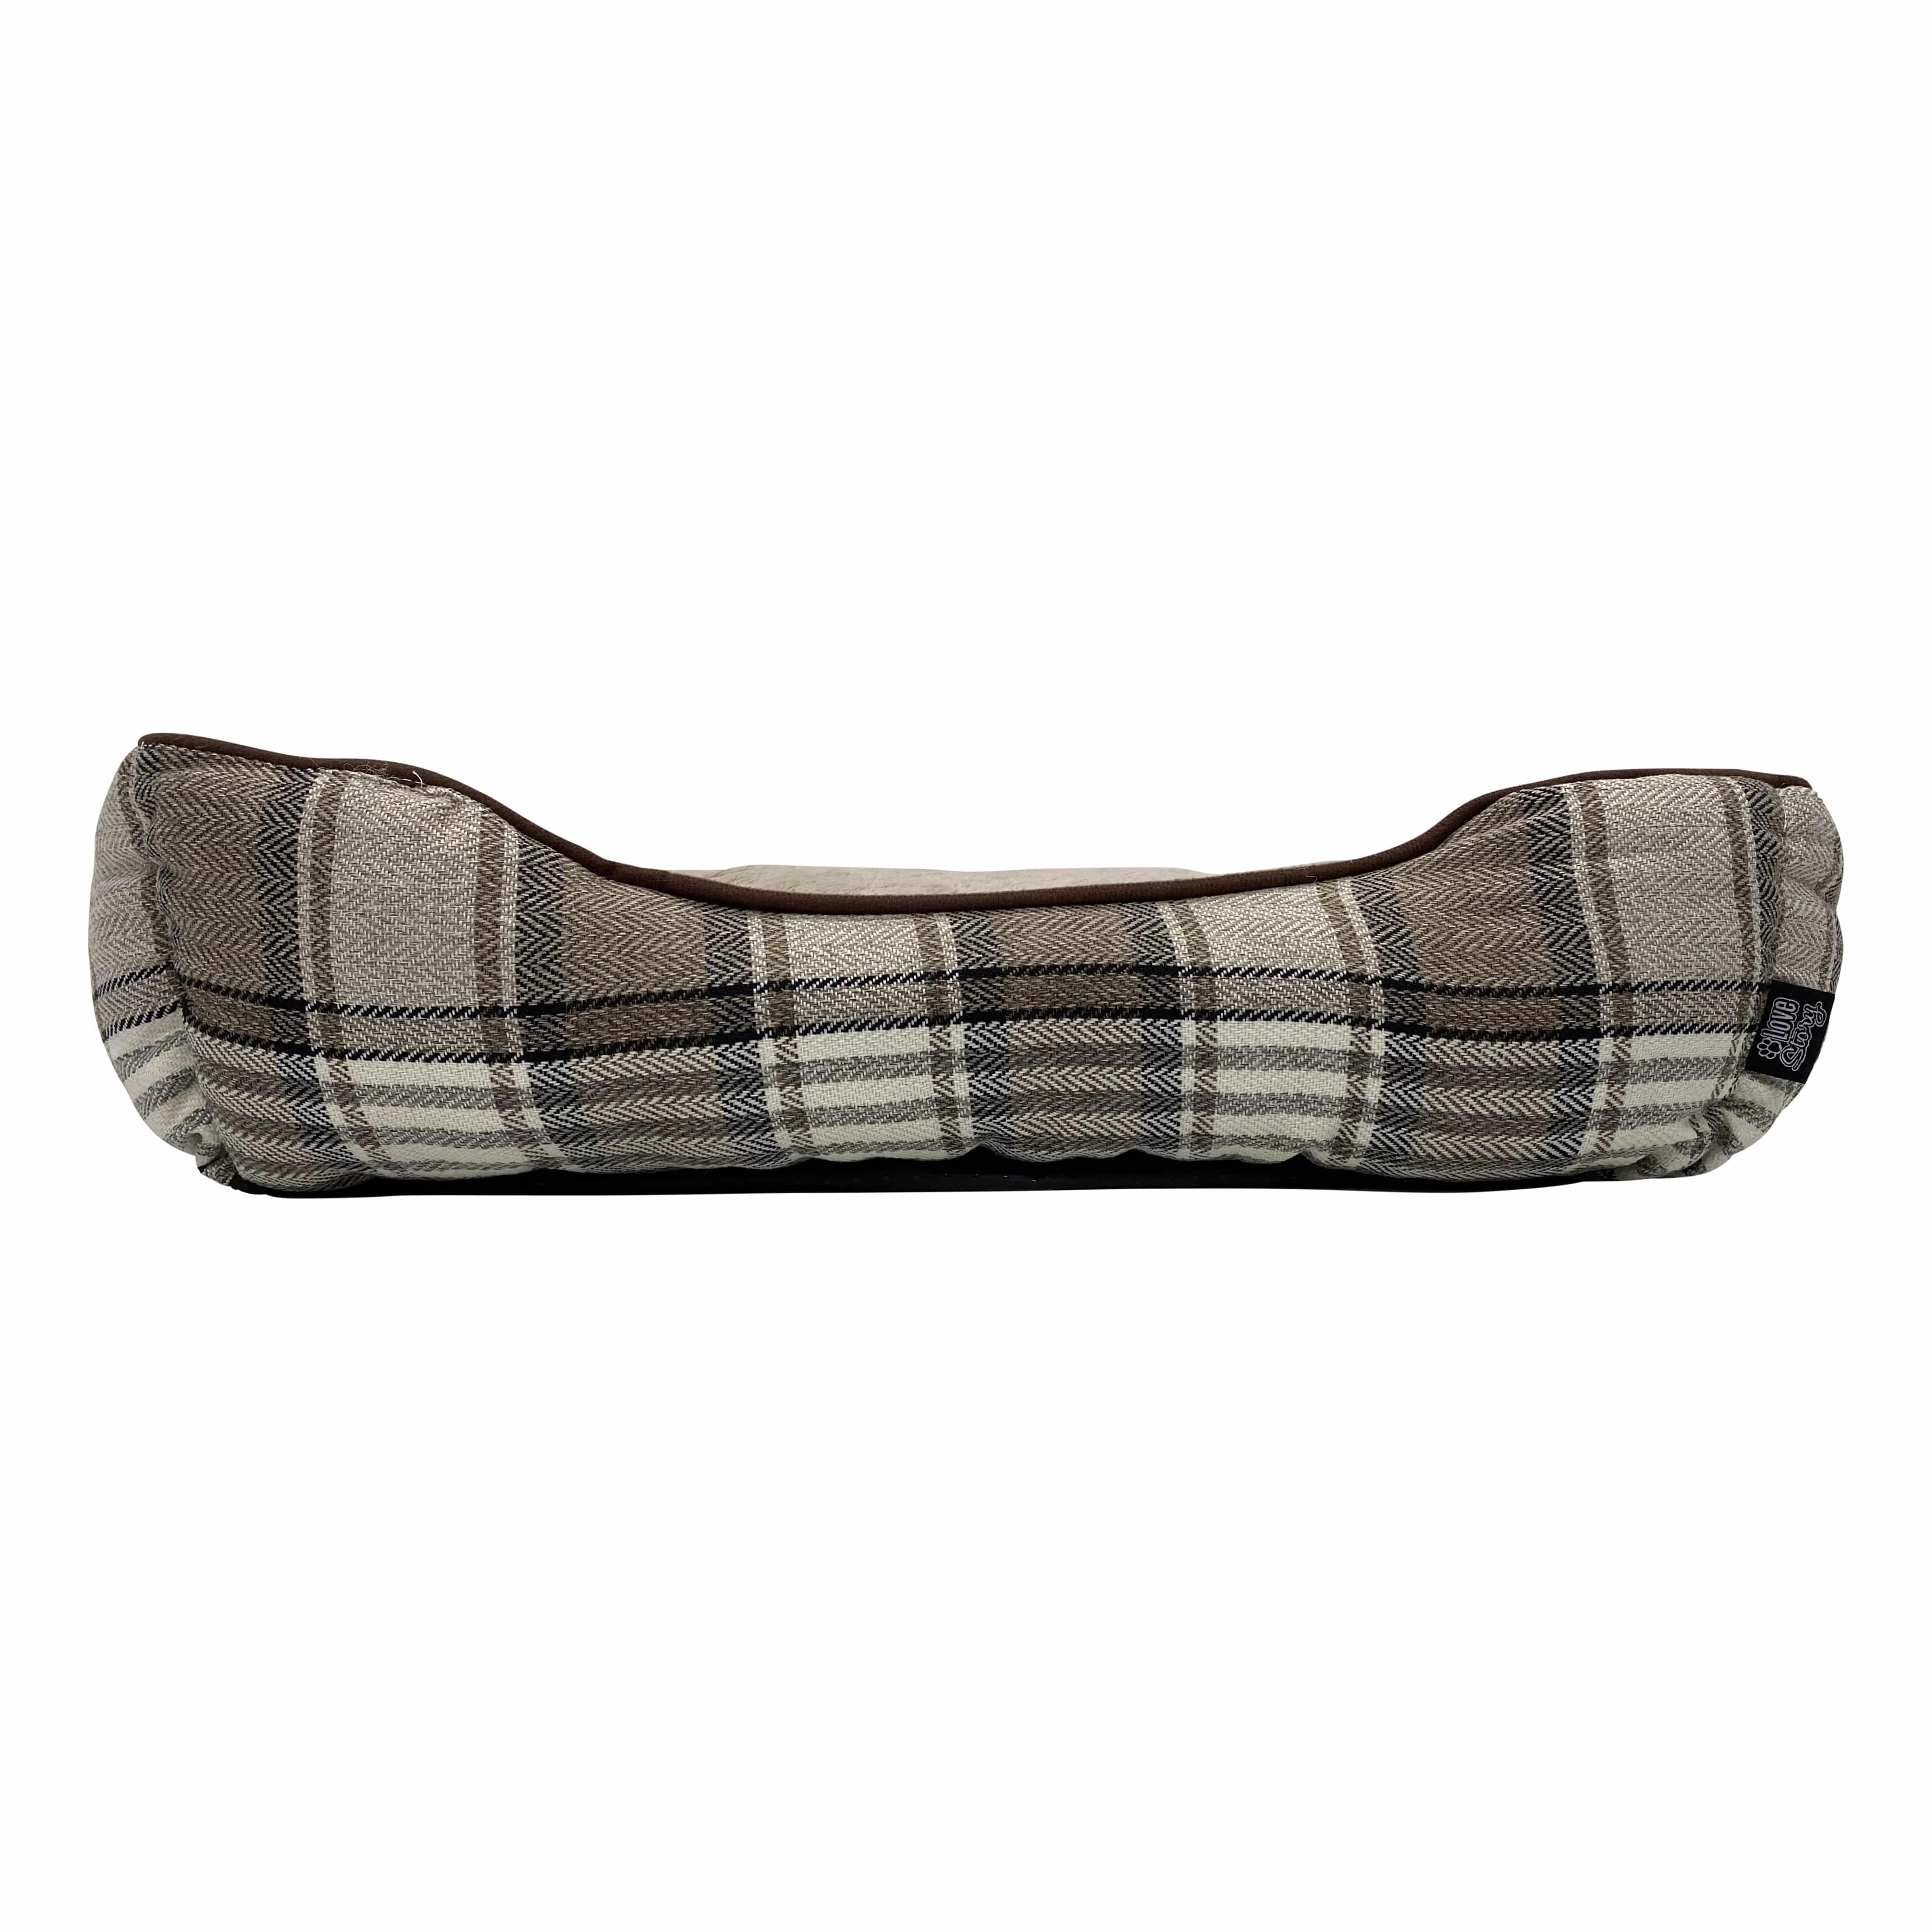 4Goodz hondenmand rechthoekig schotse ruit - 65x52 cm - Taupe